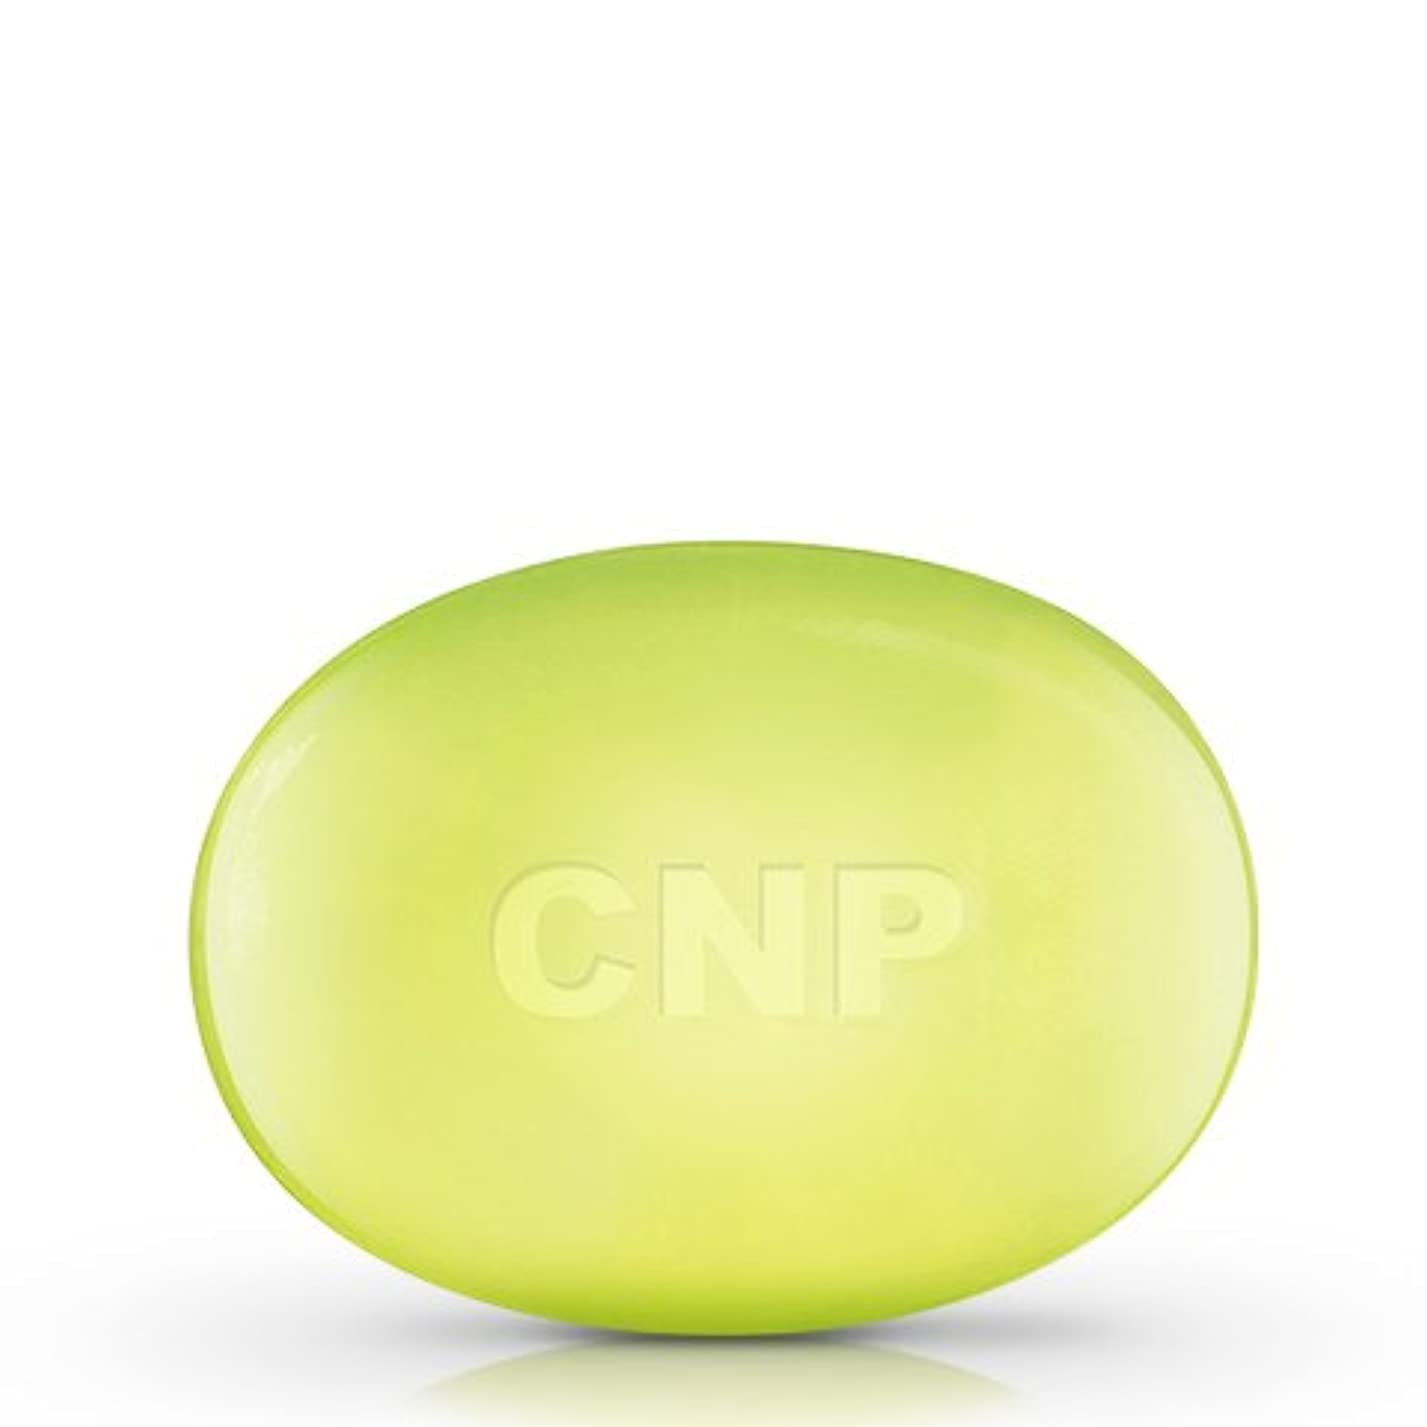 楕円形測る醸造所CNP Laboratory 石鹸A/Soap A 100g [並行輸入品]